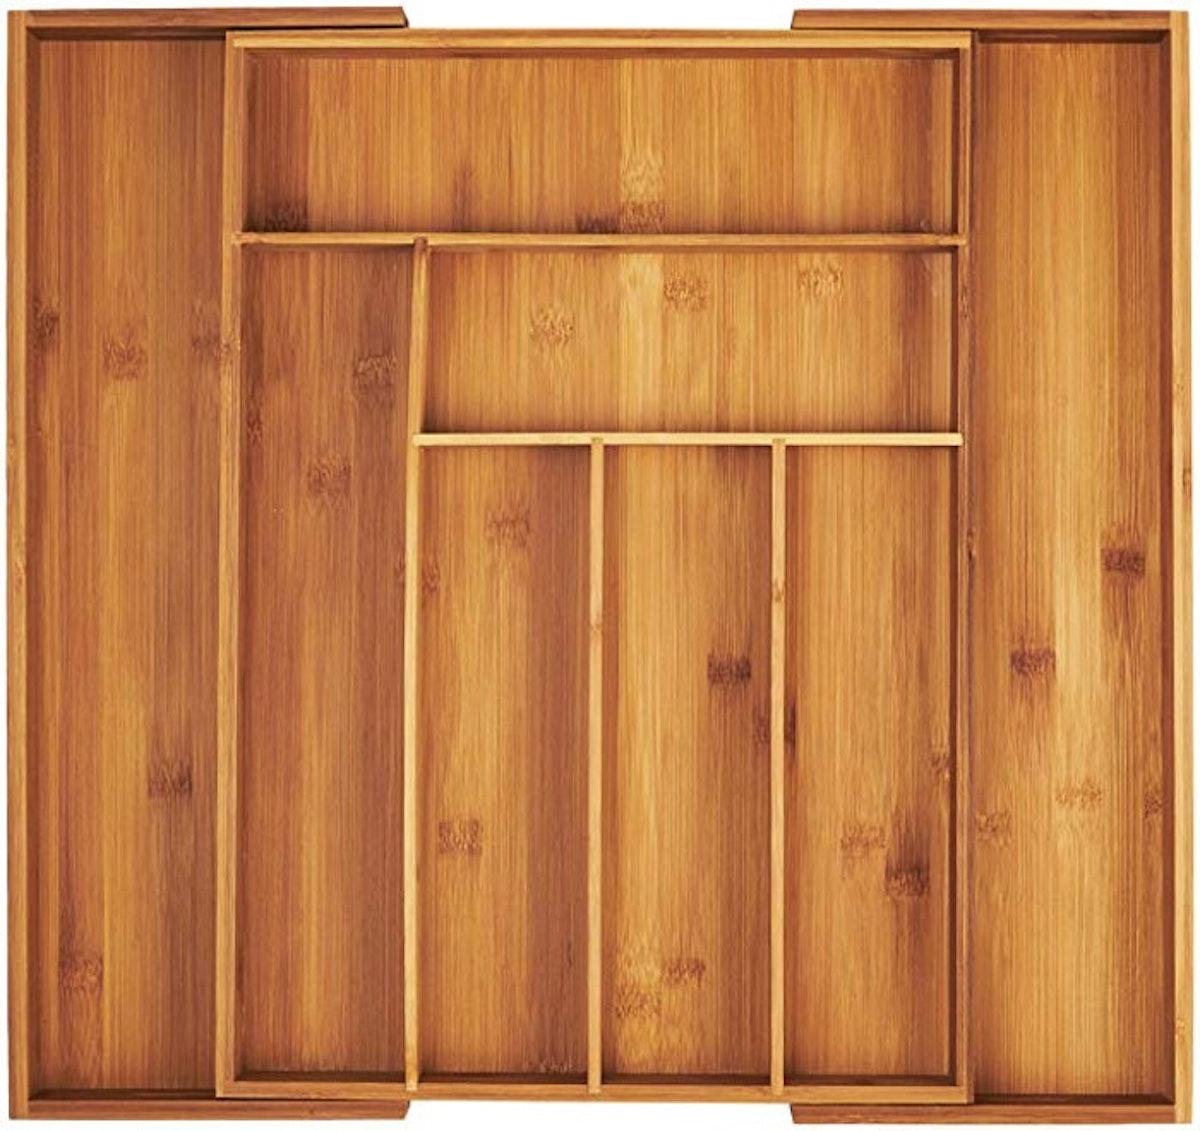 AmazonBasics Bamboo Expandable Kitchen Utensils Drawer Organizer